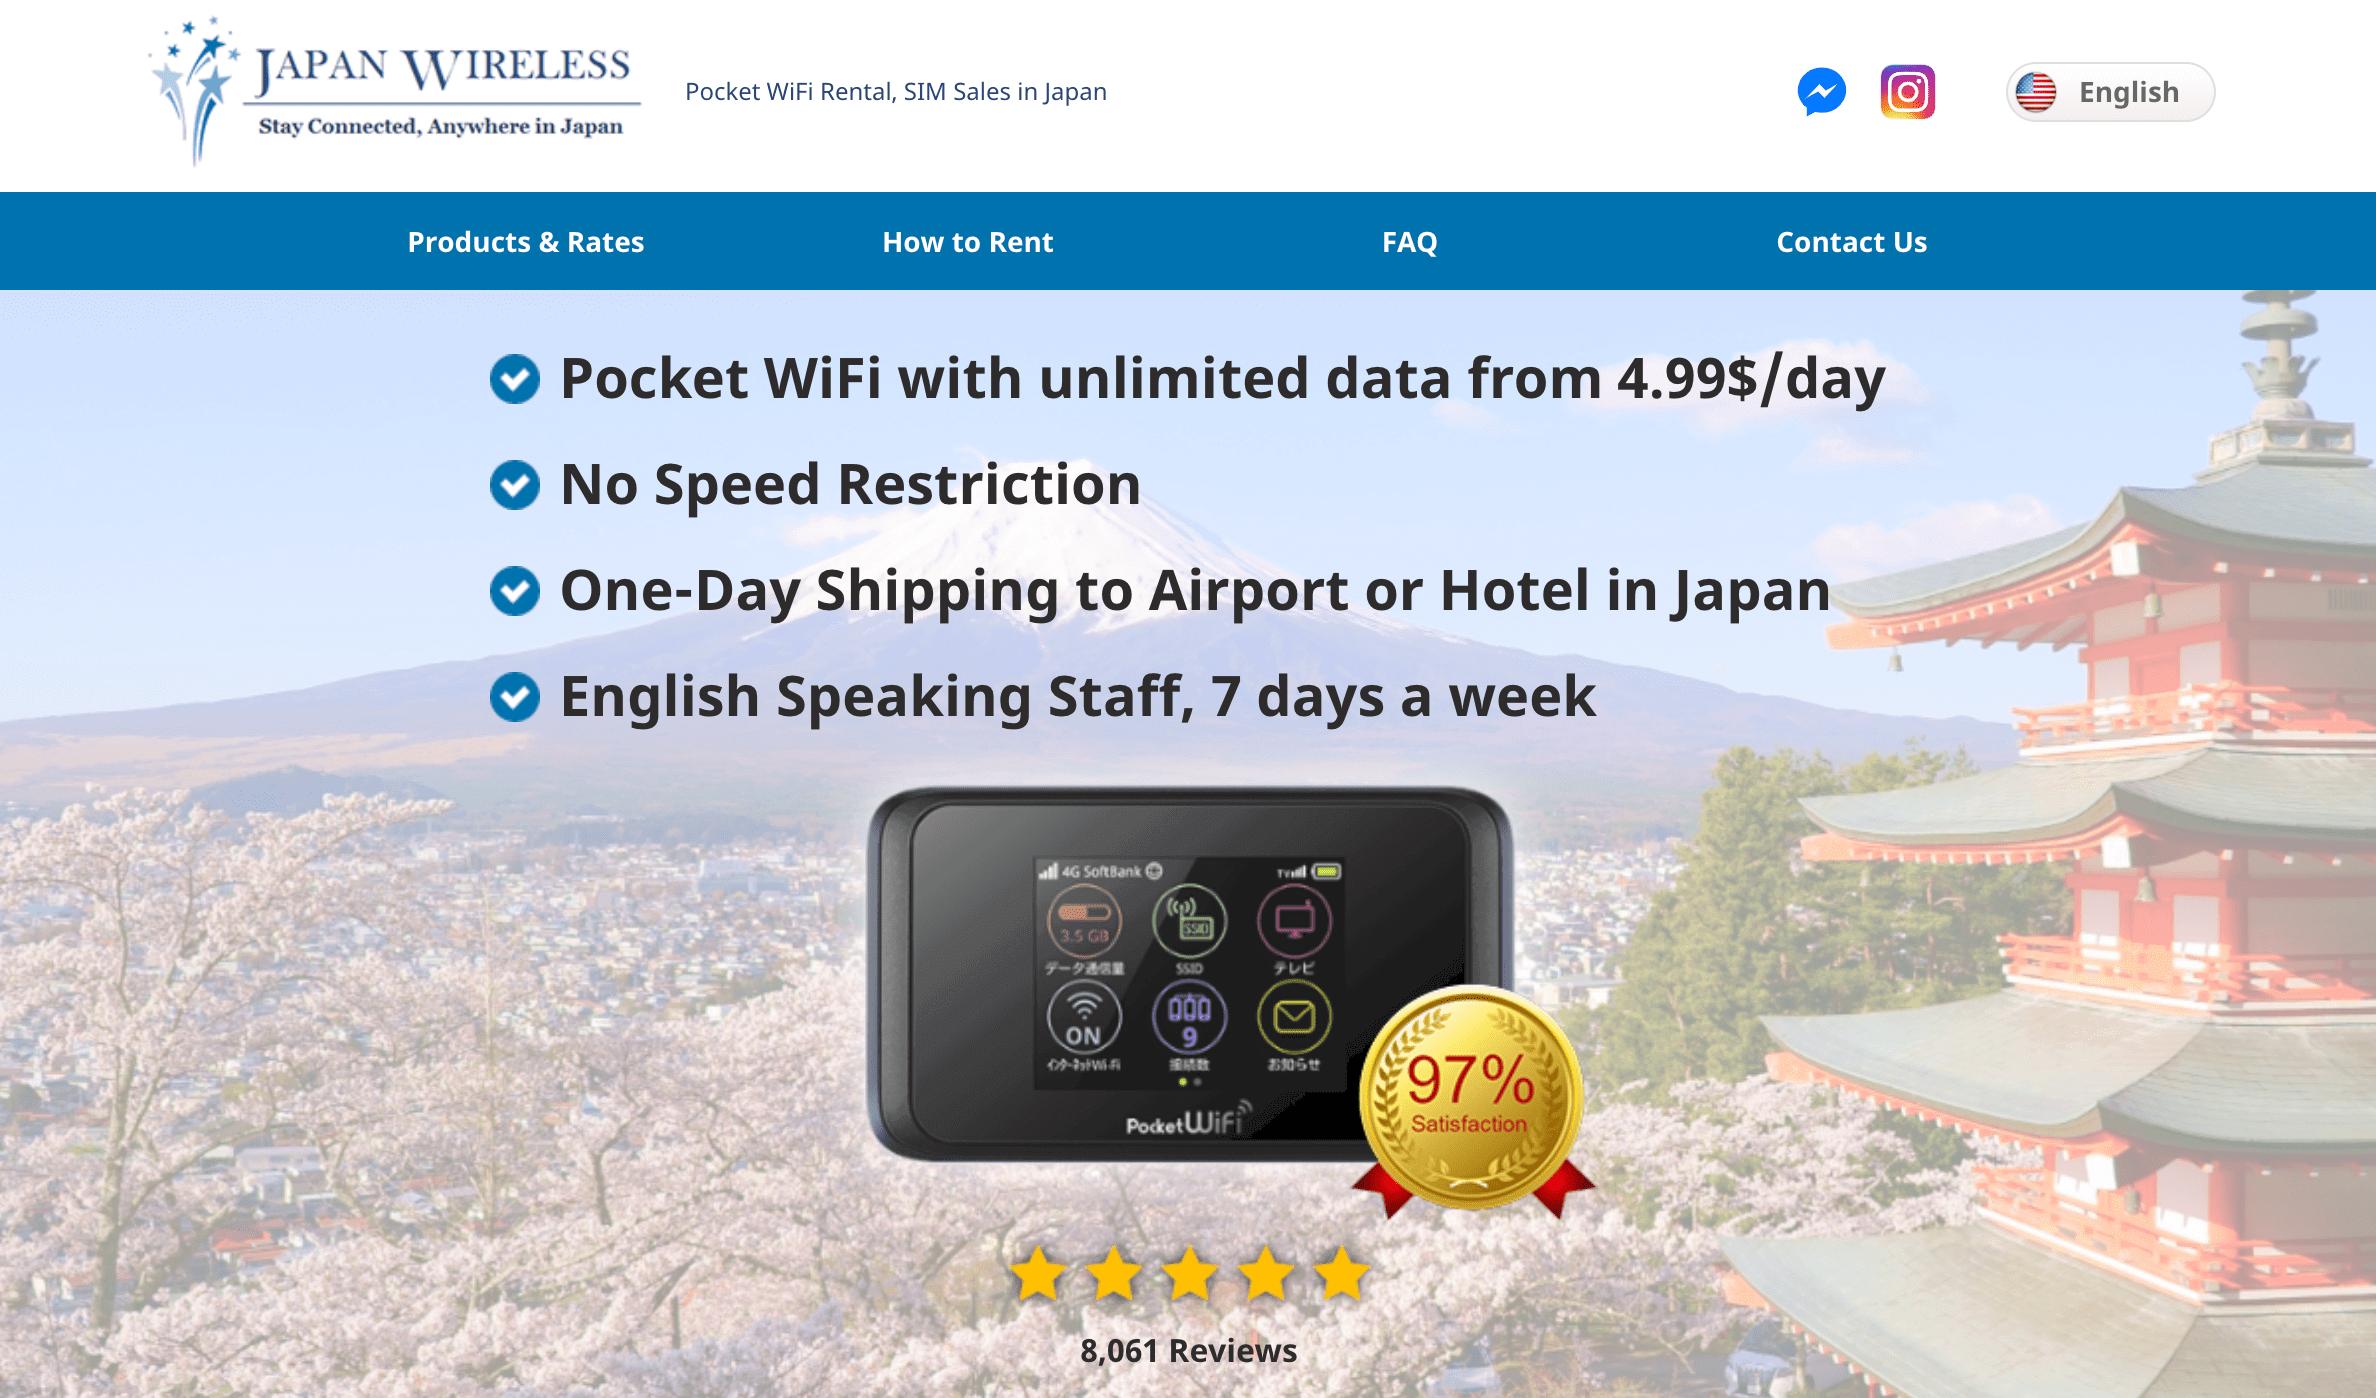 japan wireless screenshot